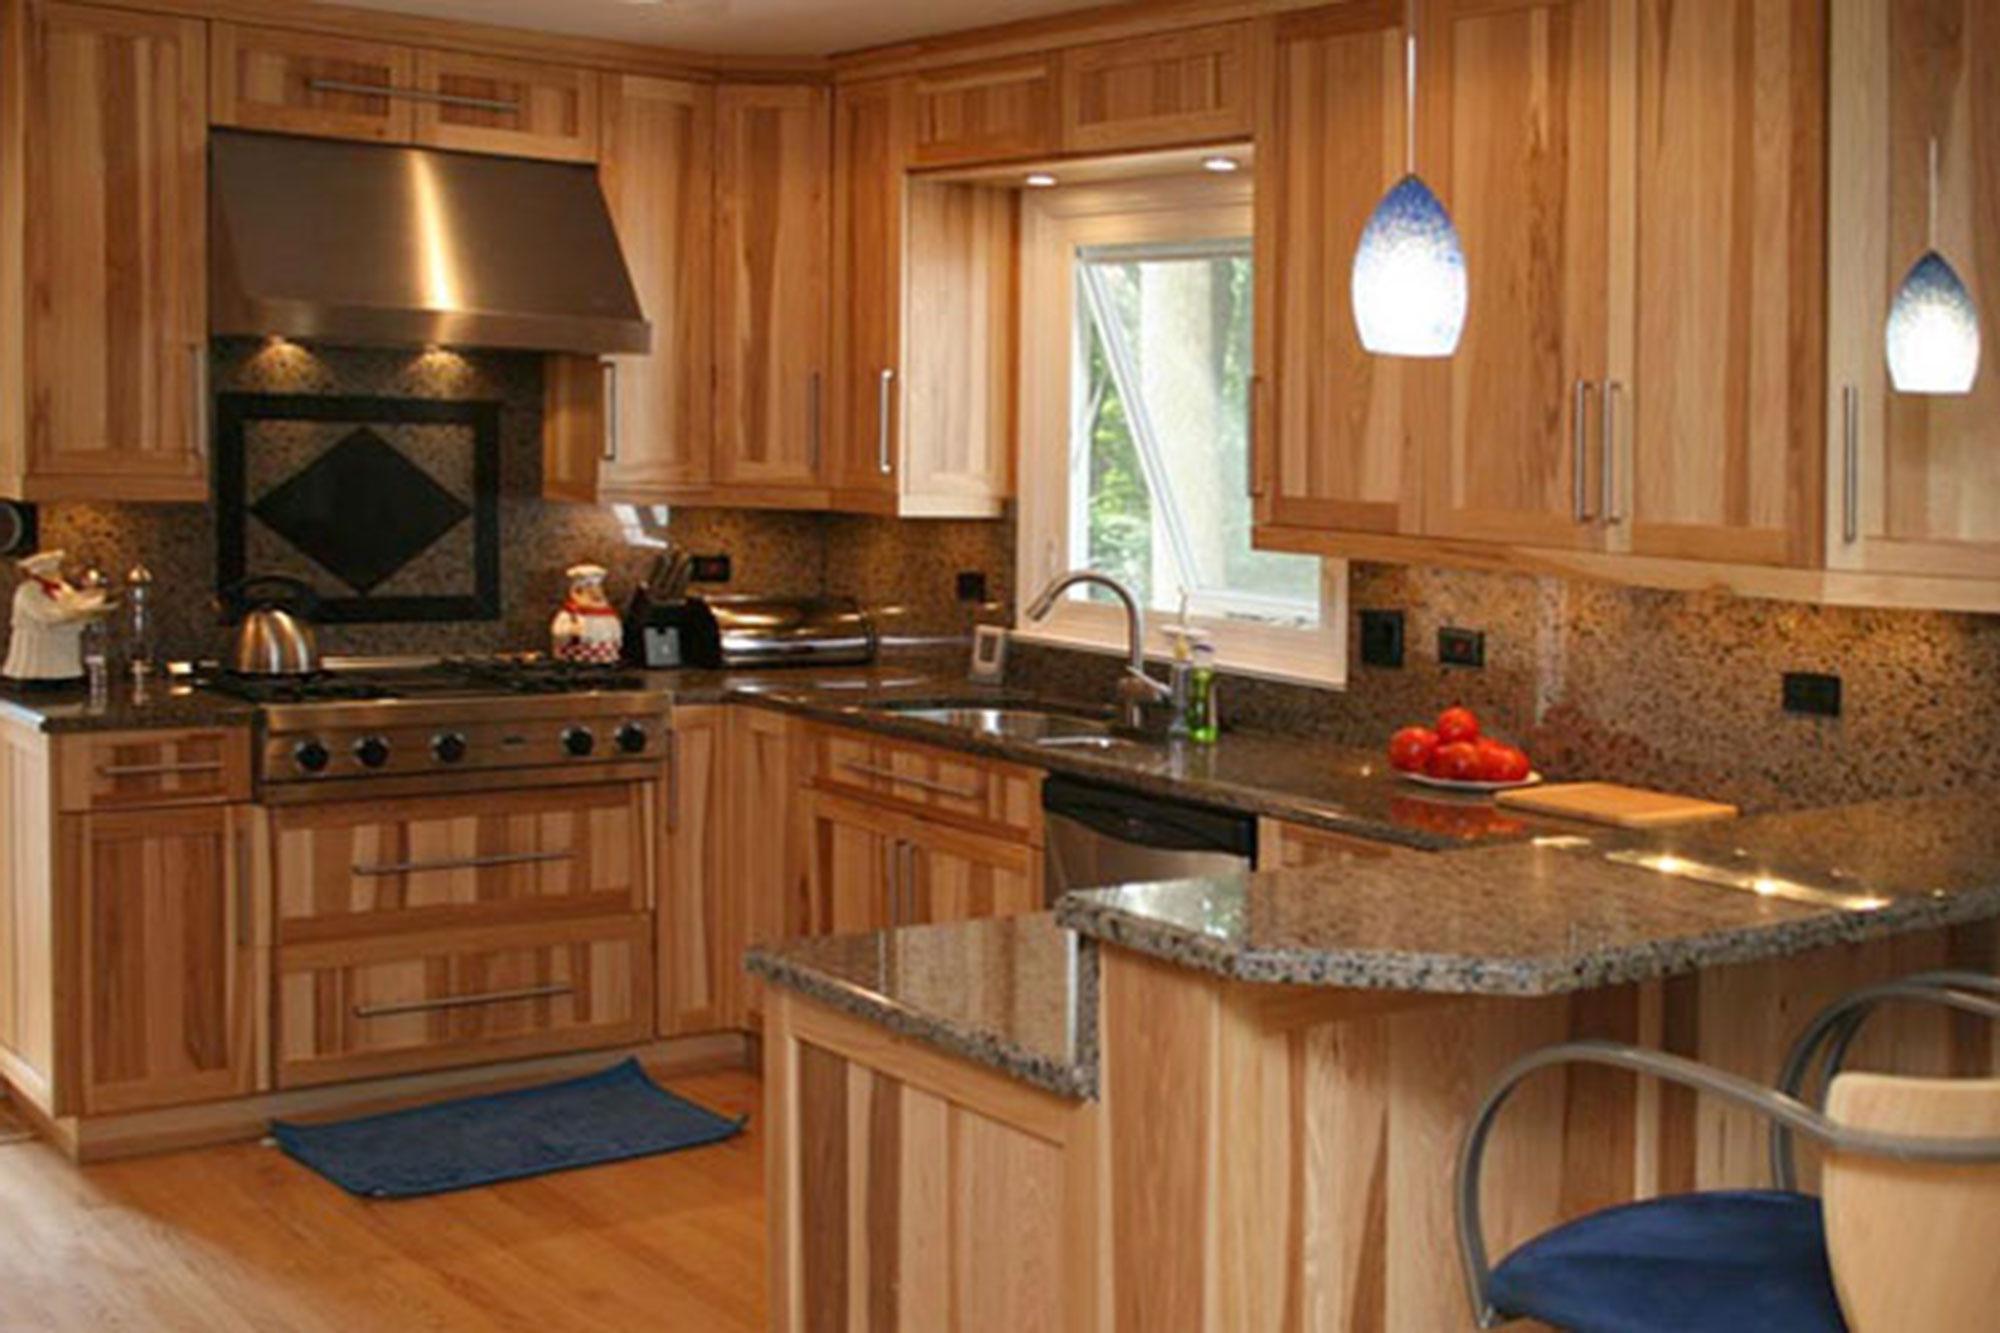 Hickory Wood Custom Kitchen Cabinets Hickory Wood Cabinets O19